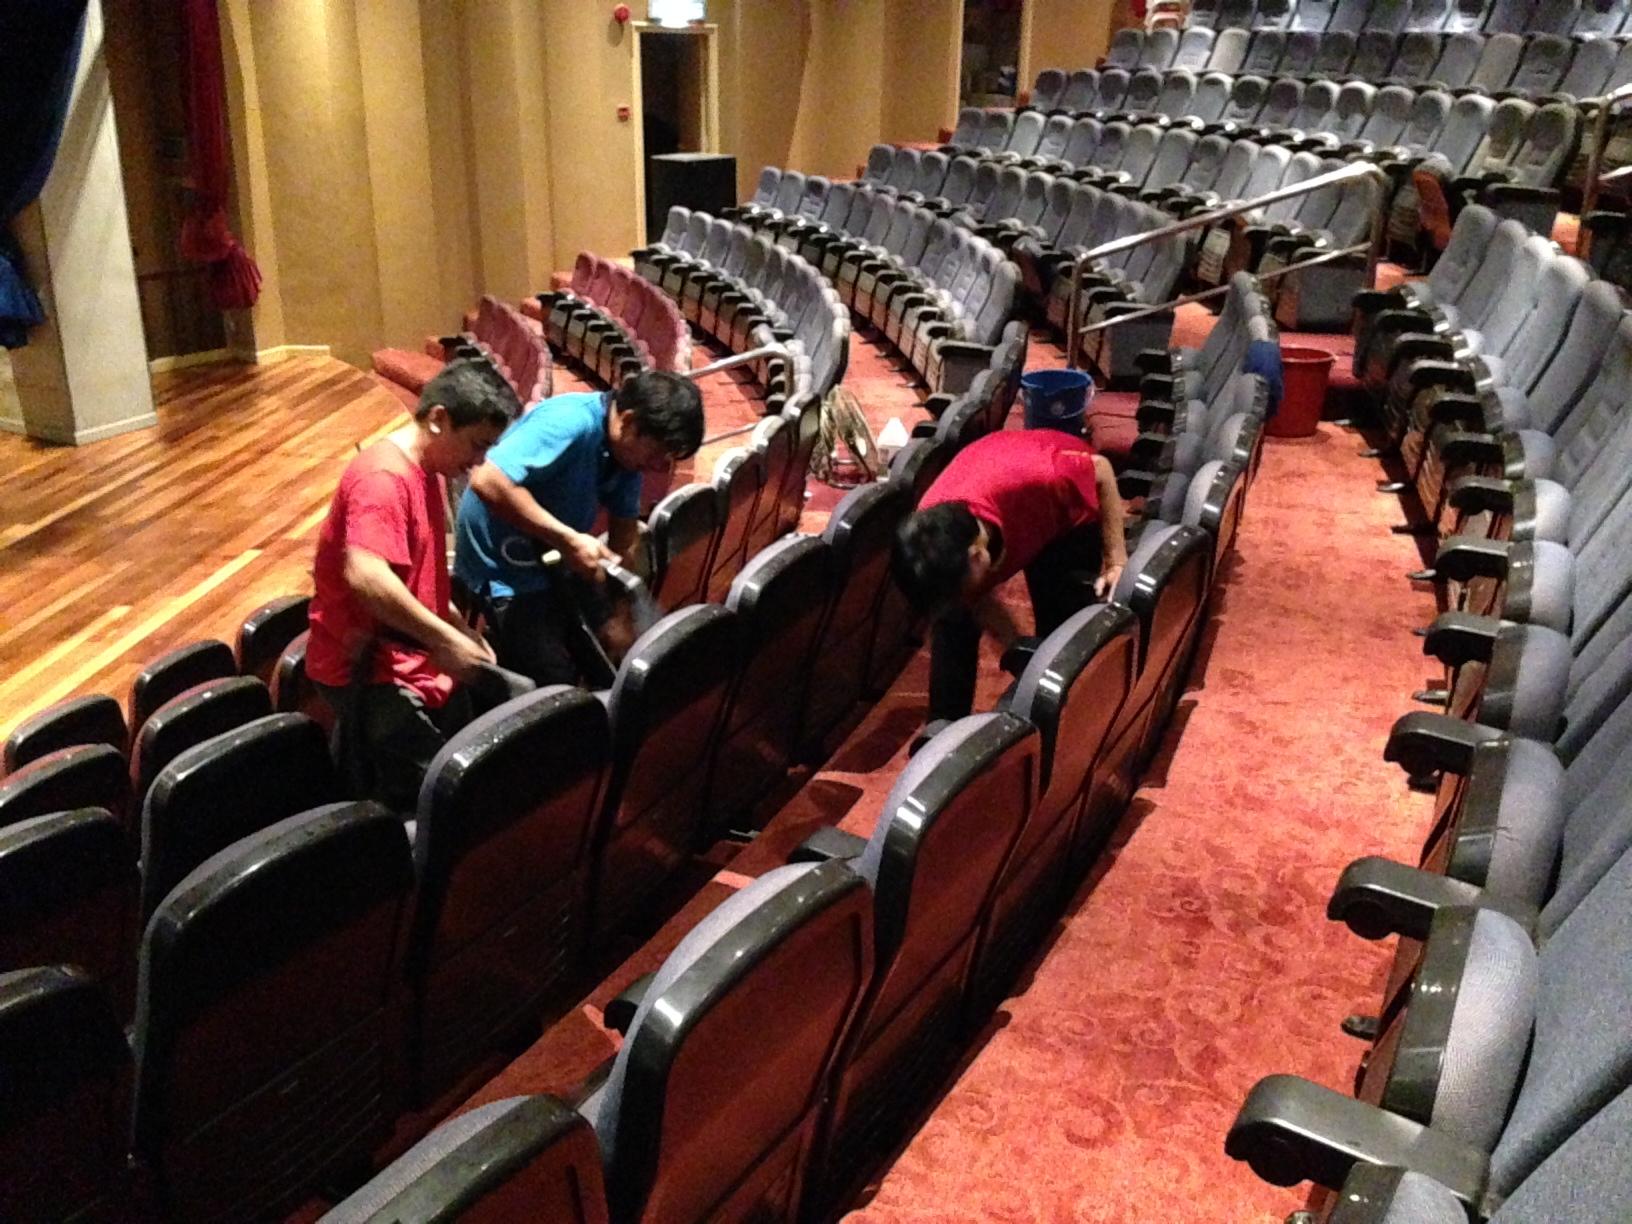 Gallery Carpet Cleaning Service Kuala Lumpur Malaysia